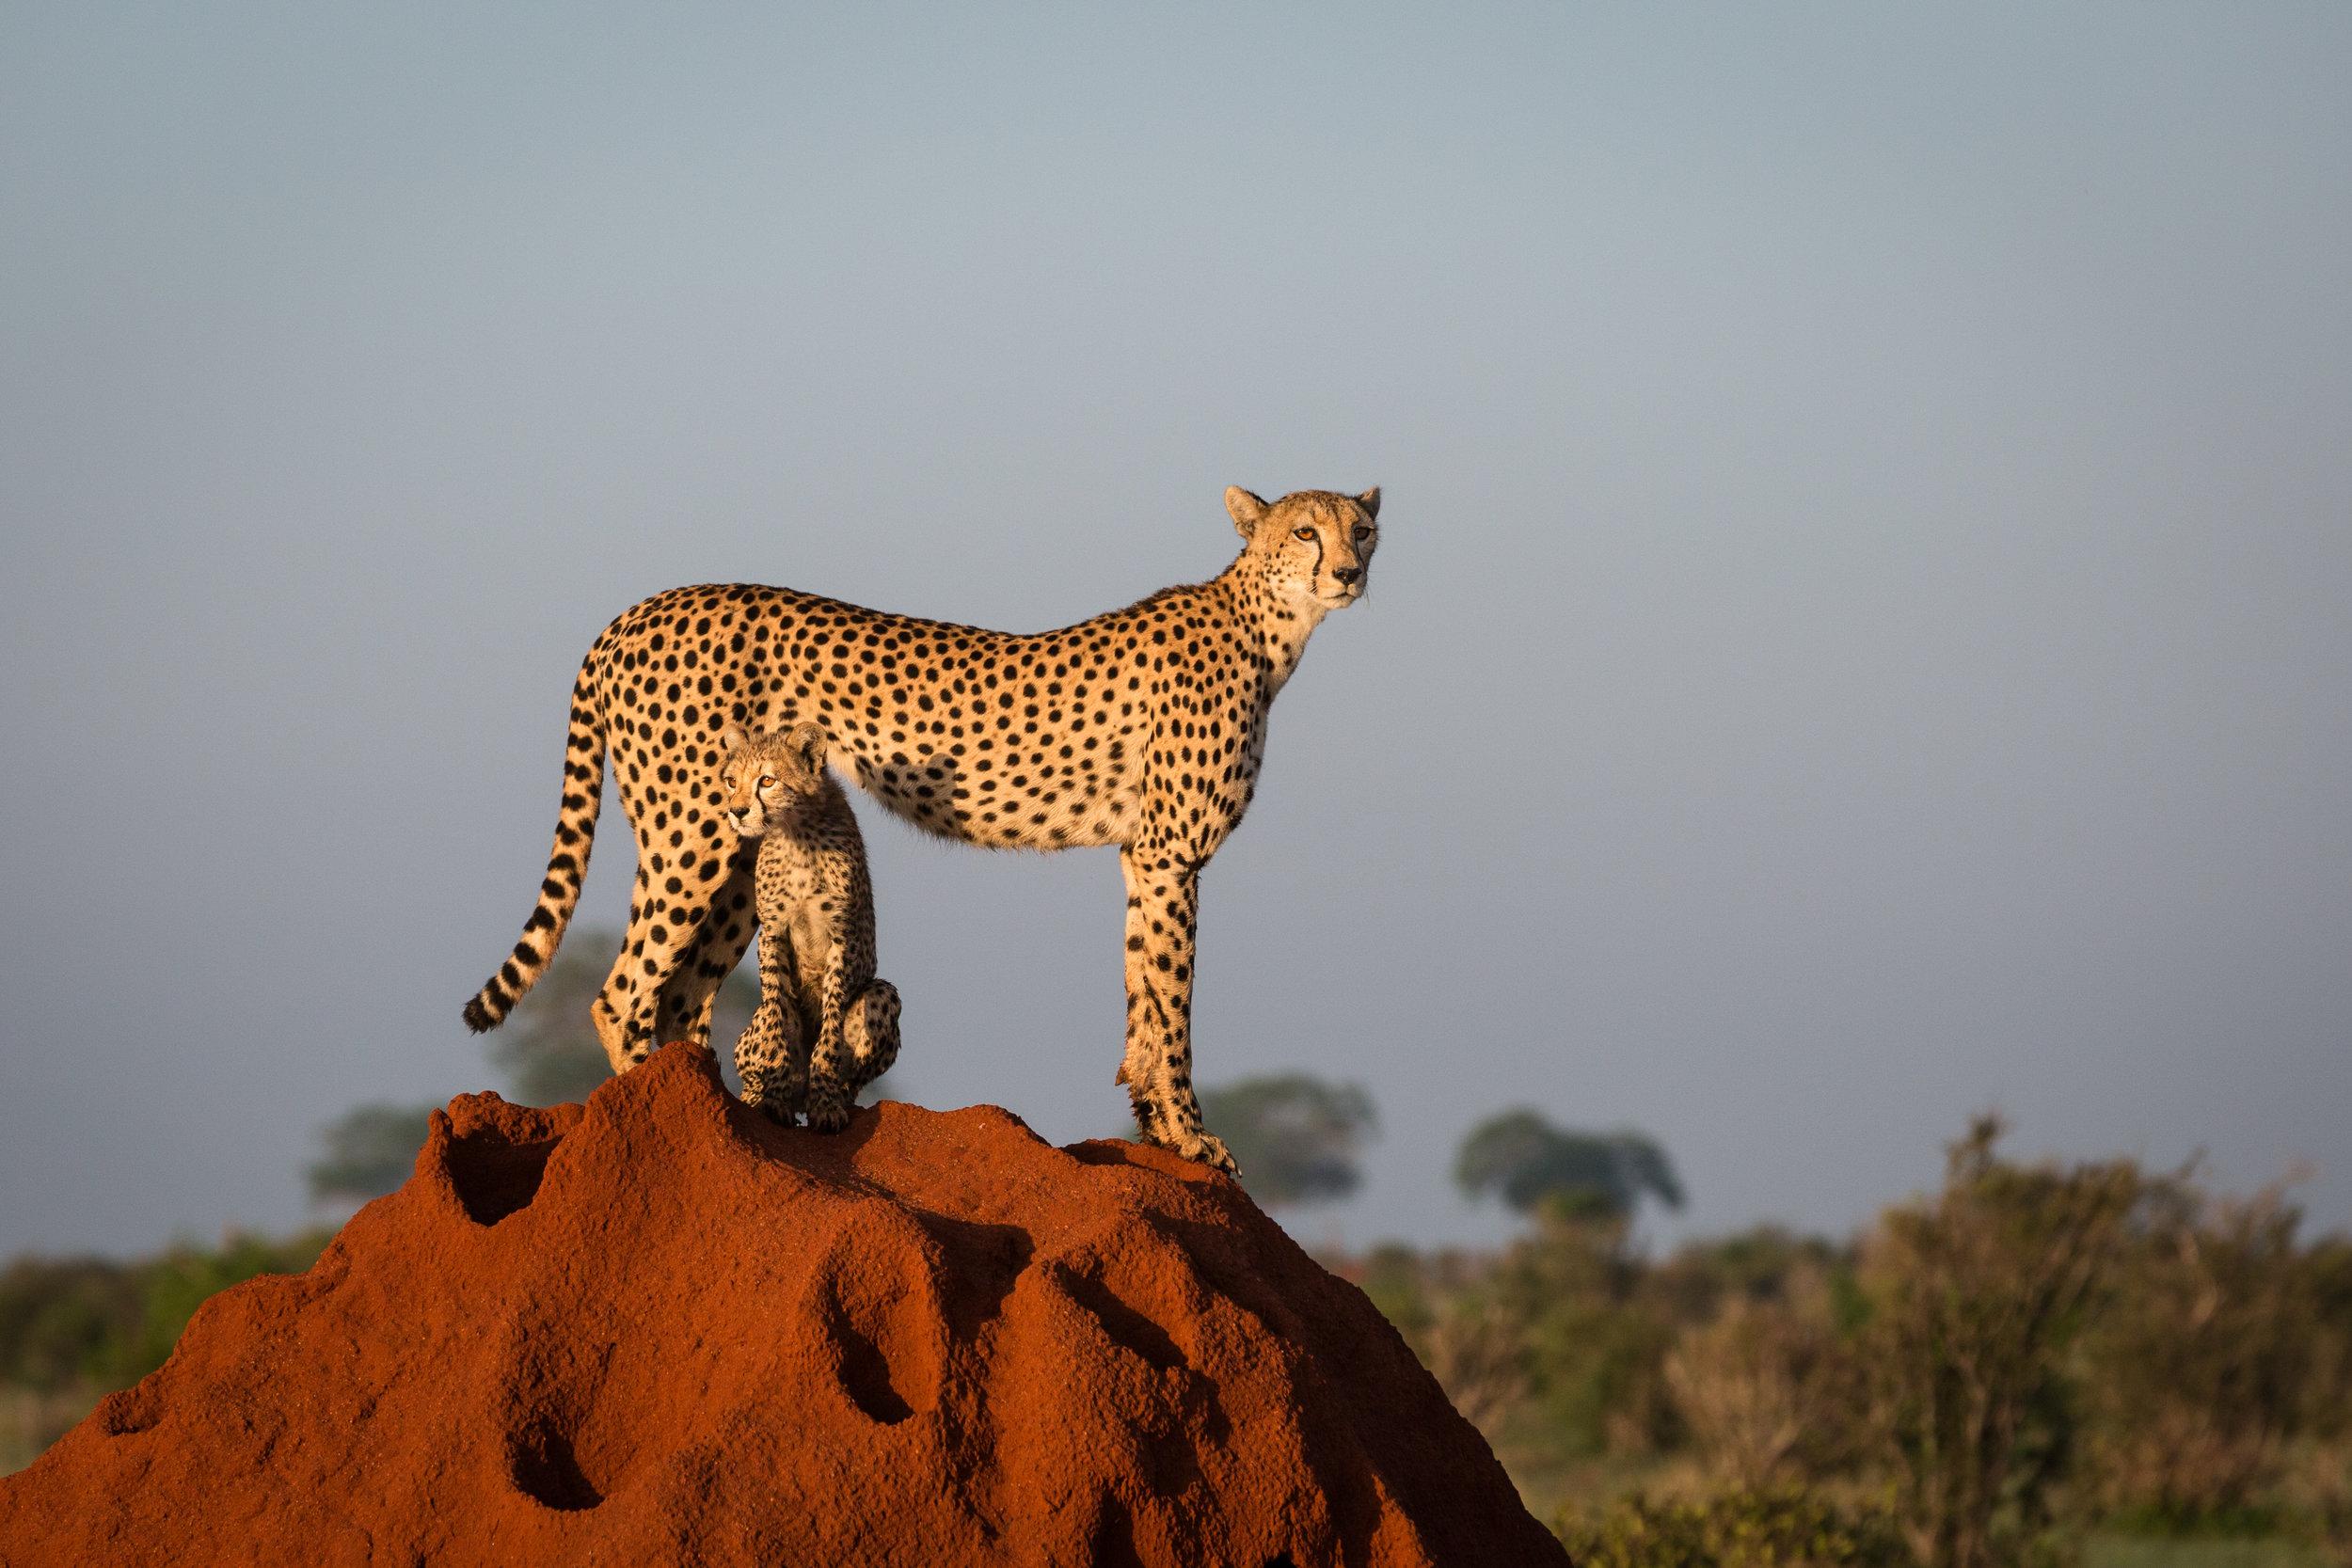 Cheetah and Cub Original-1.jpg